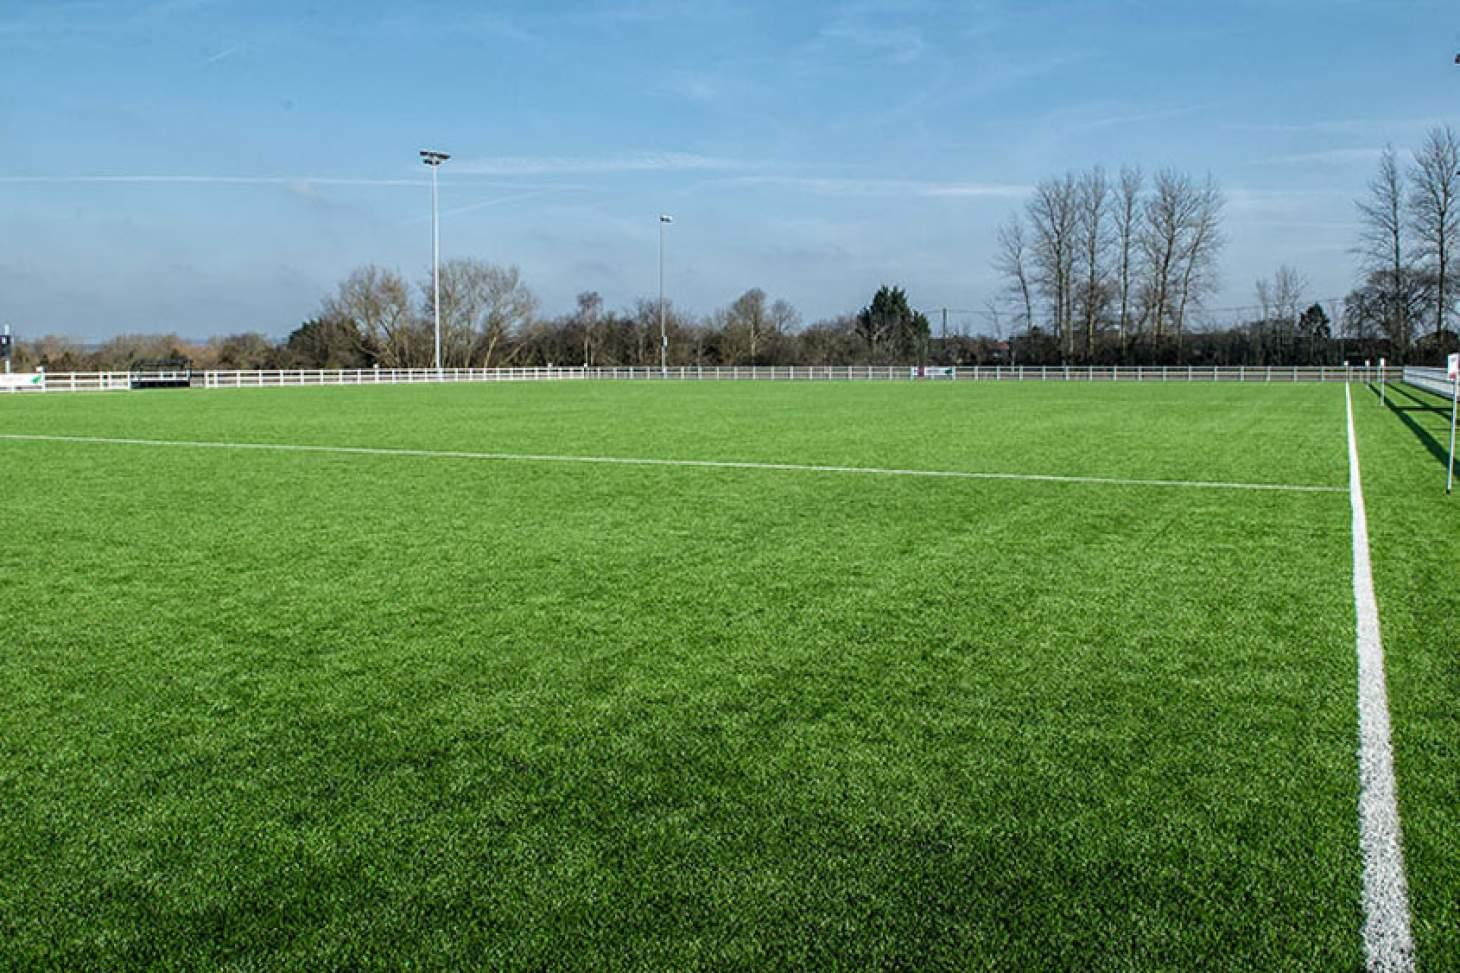 PlayFootball Ivybridge 8 a side | 3G Astroturf football pitch